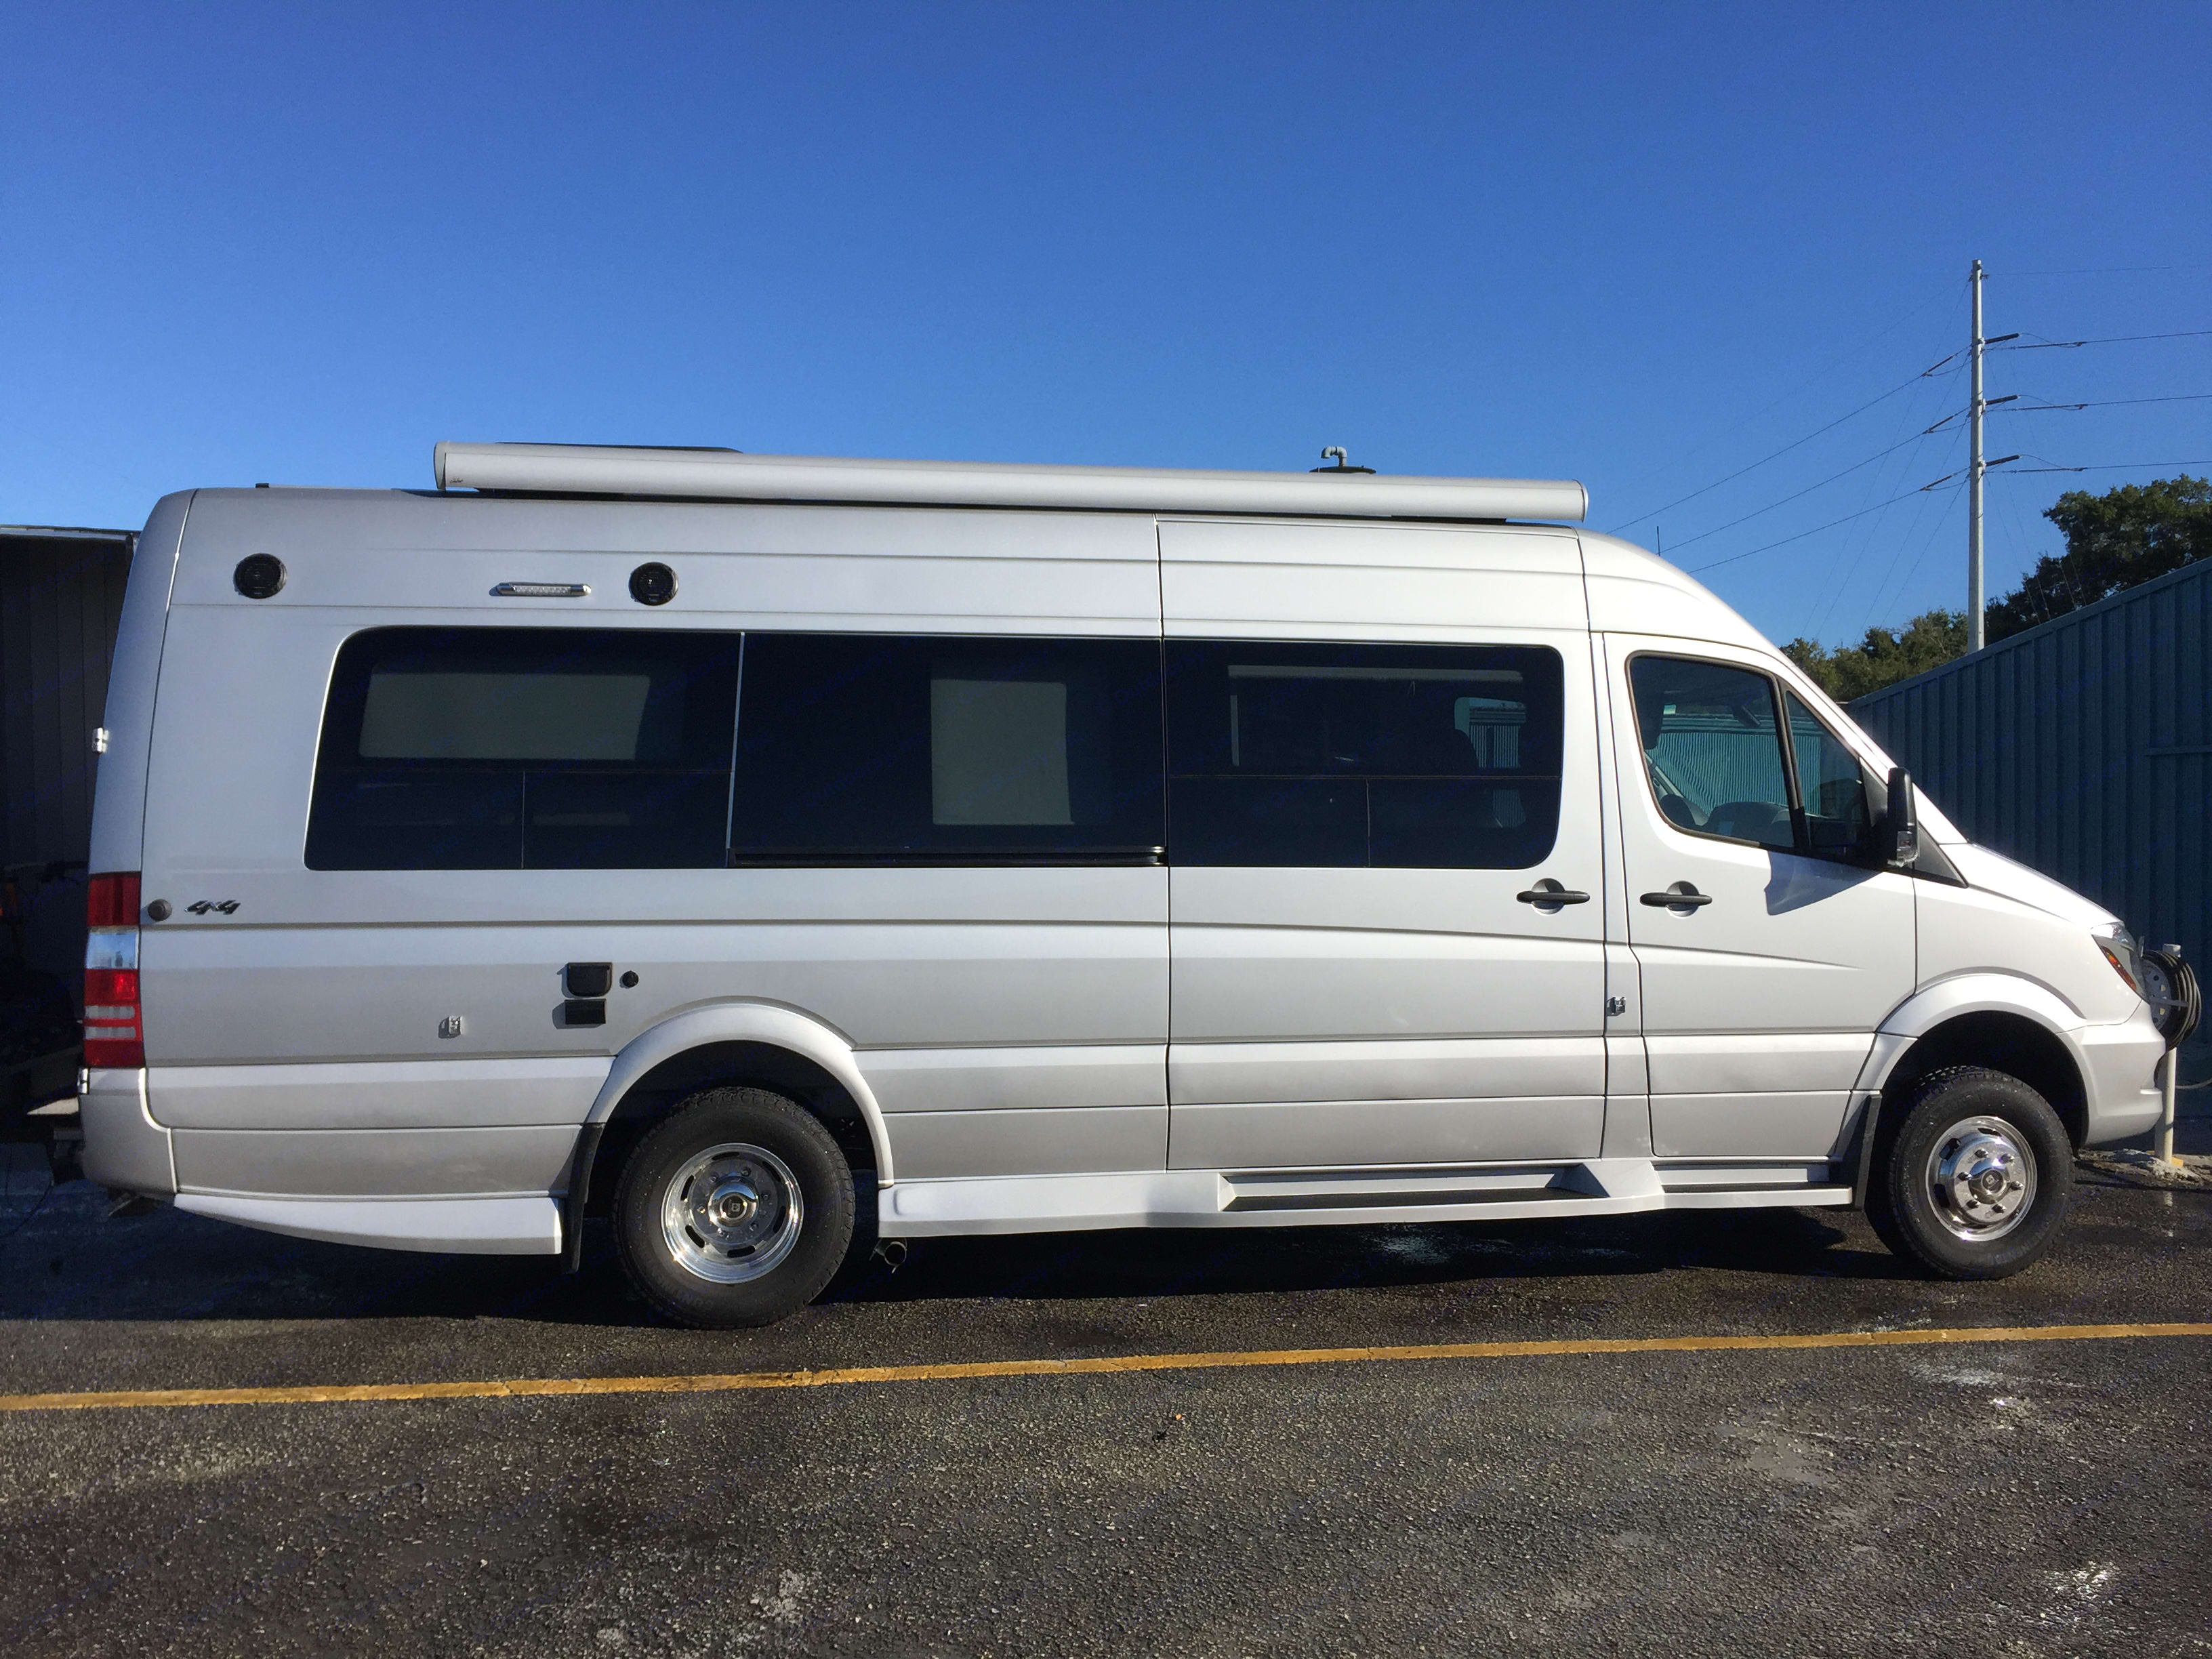 Awning is located on the passenger side of RV. Winnebago Era 2017